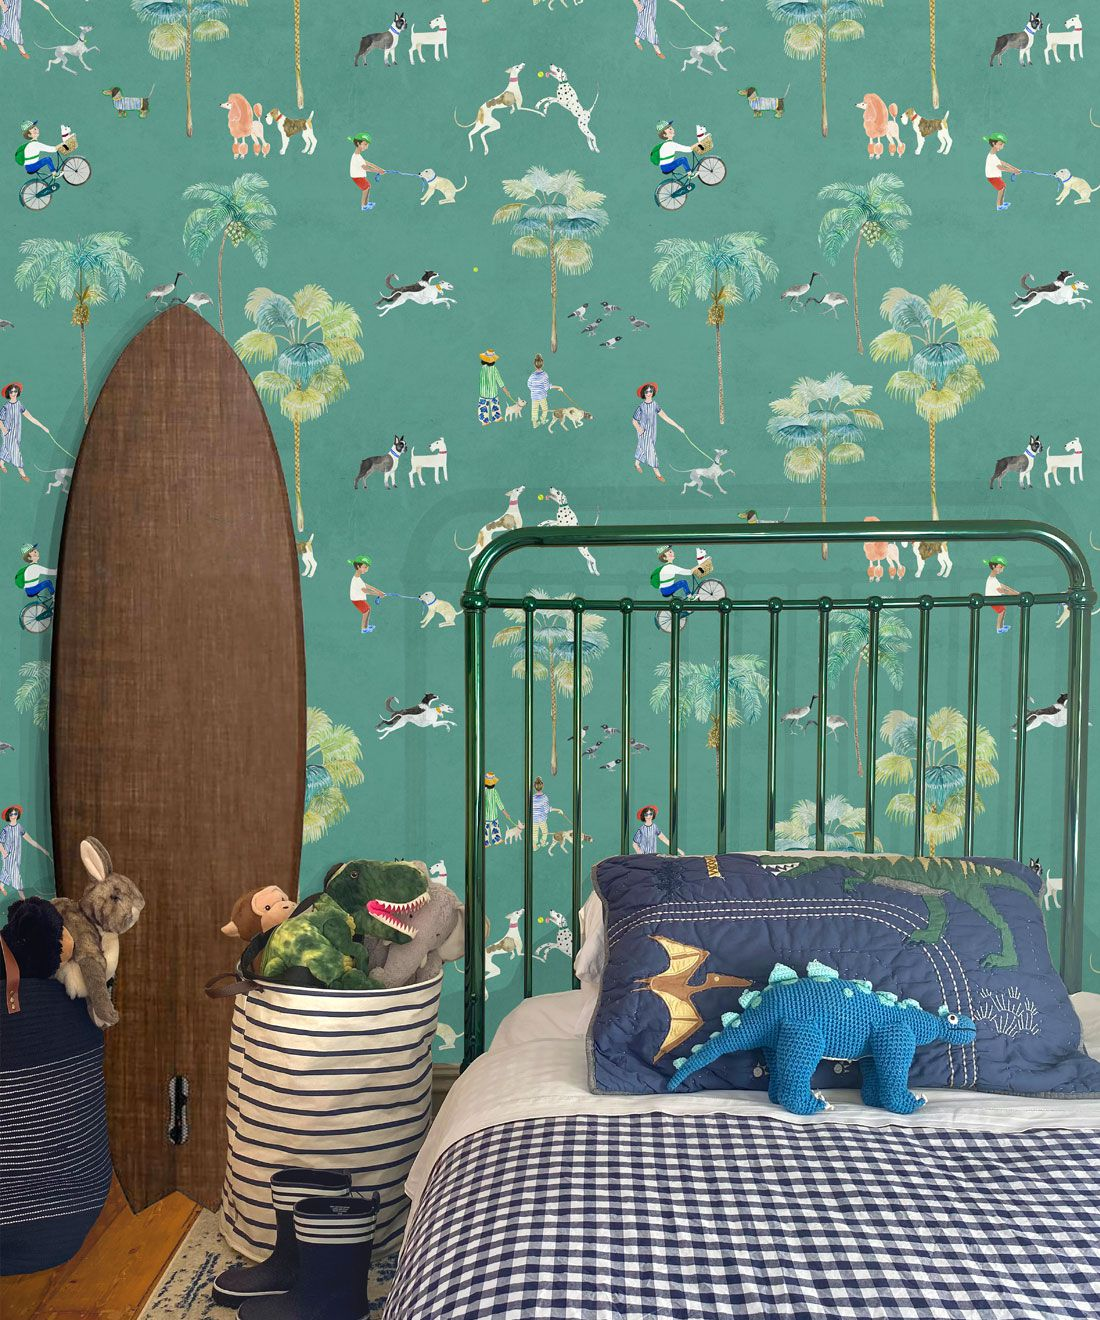 At The Dog Park Wallpaper •Kids Wallpaper • Turquoise • Insitu